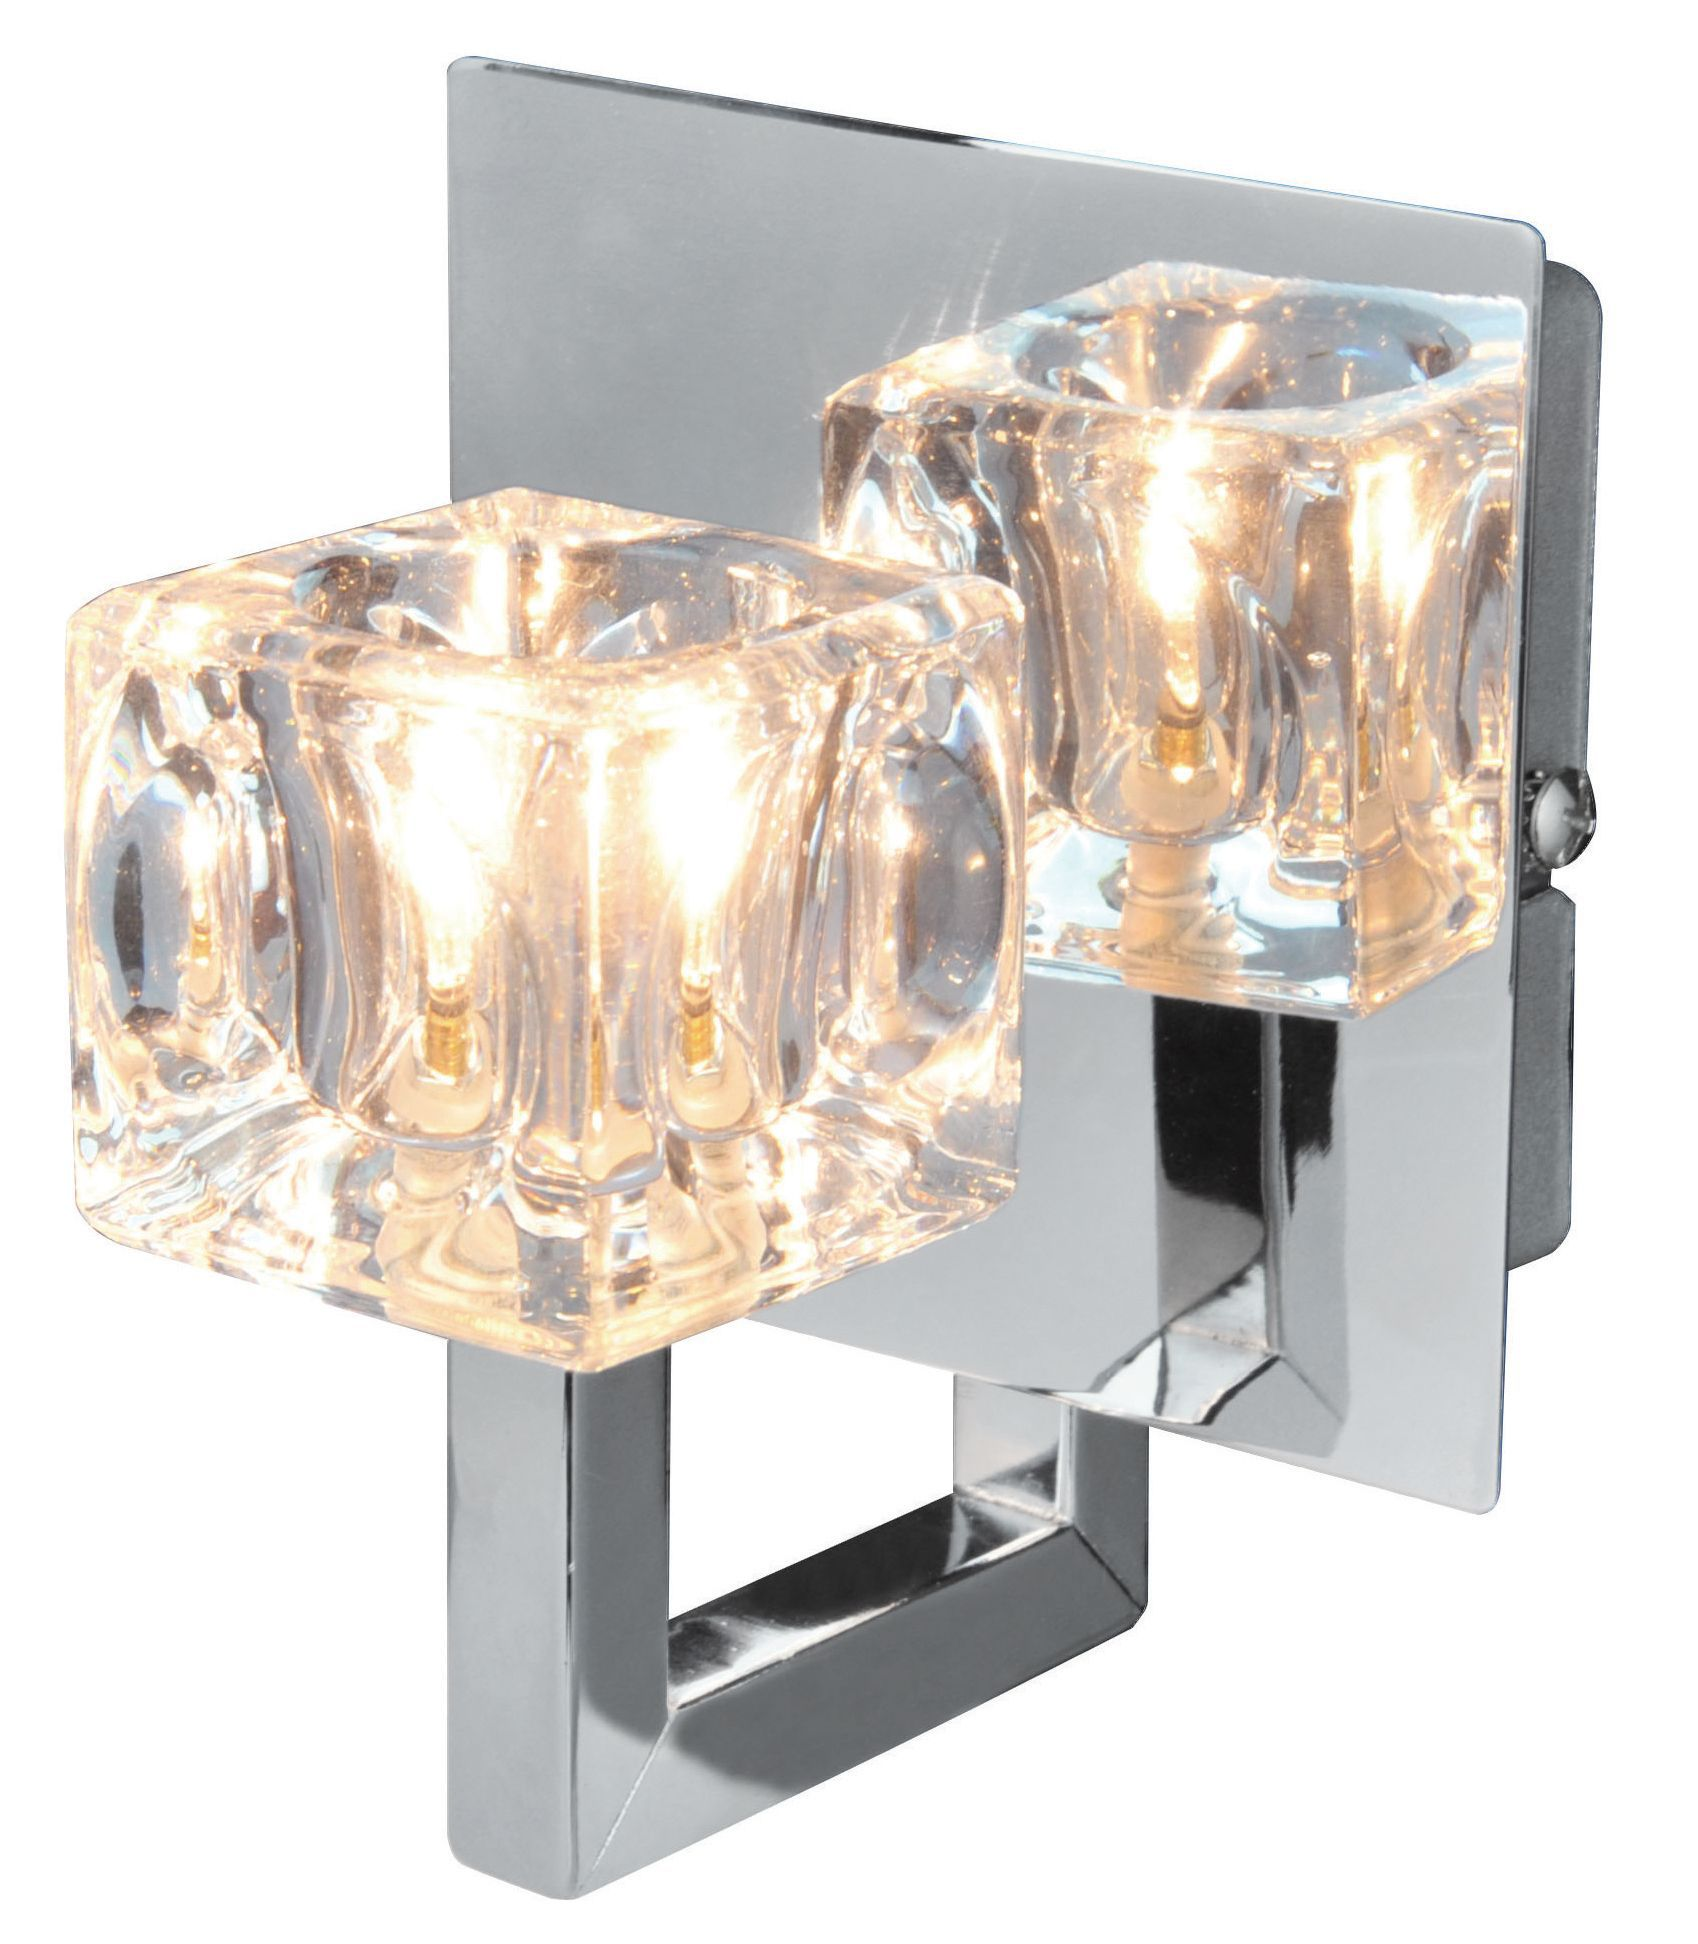 Outside Lights Wickes: Glace Chrome Effect Single Wall Light